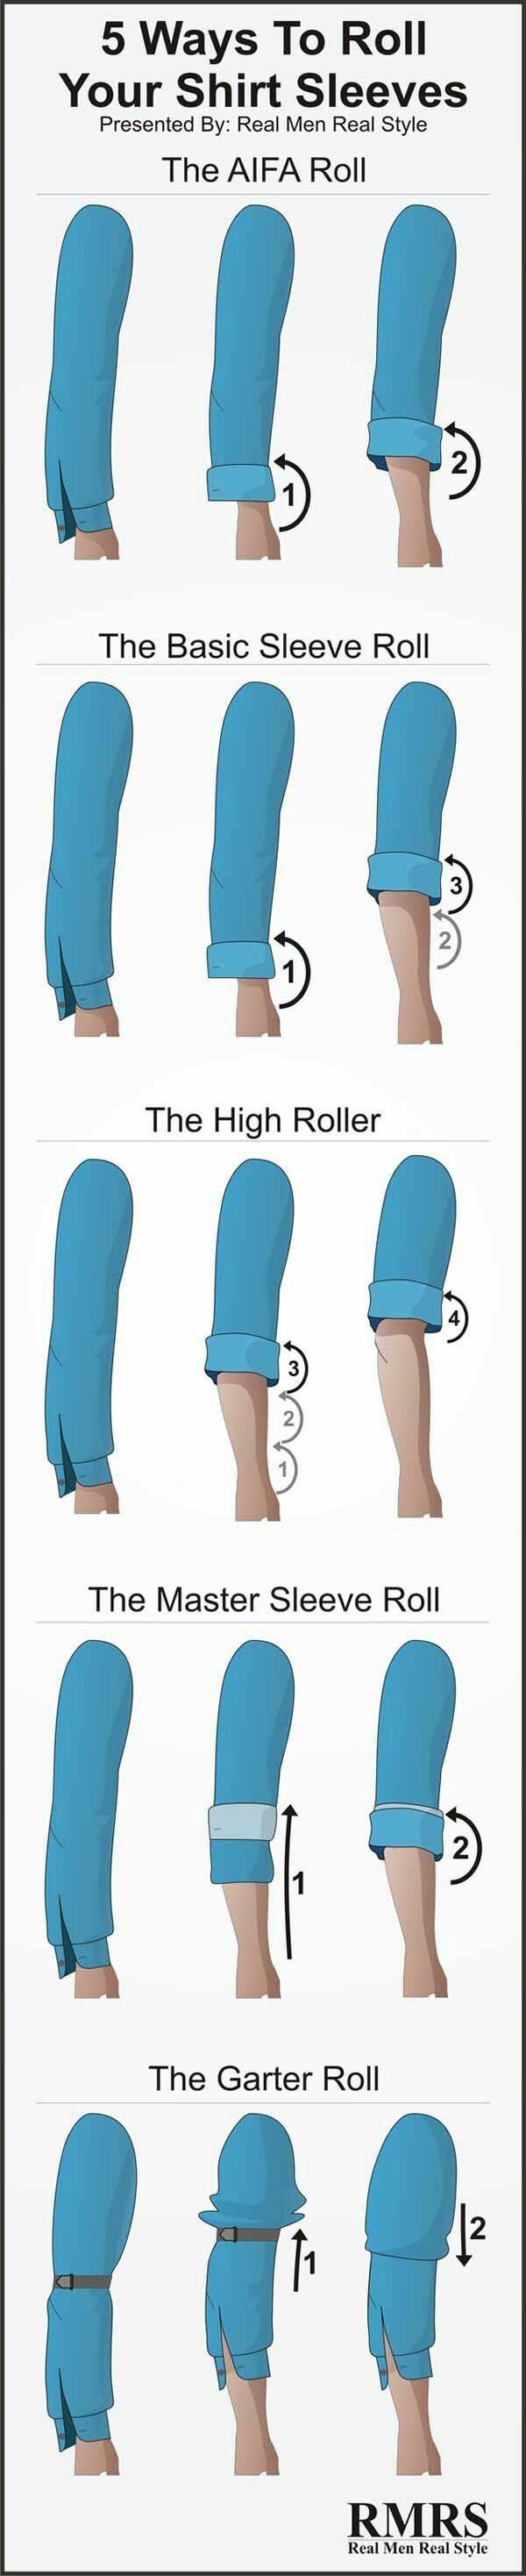 Type Of Shirt Roller